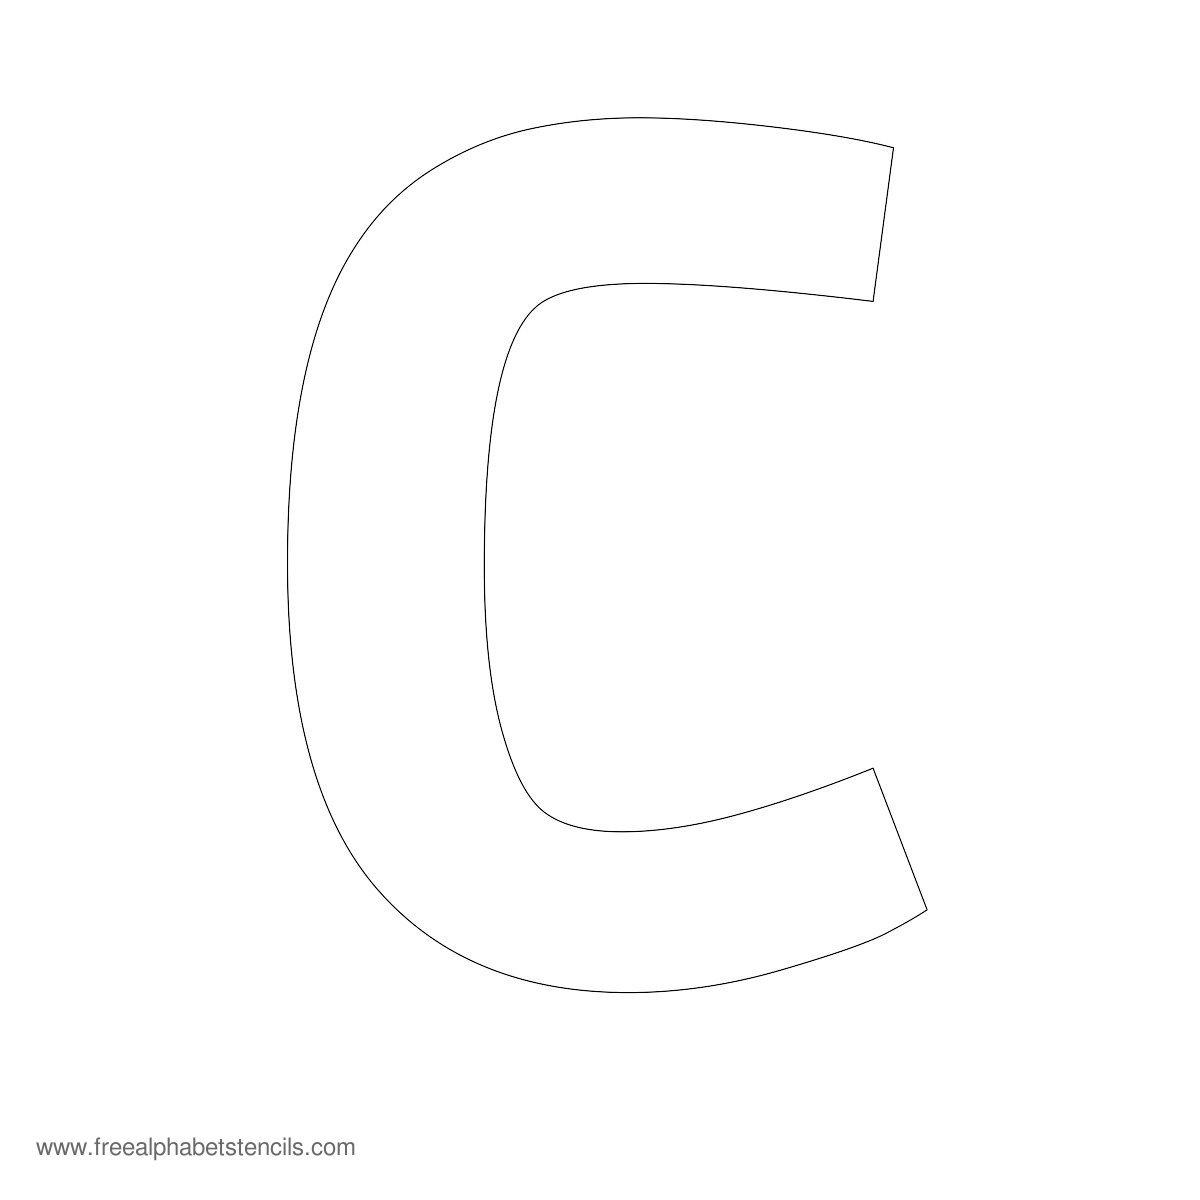 Large Alphabet Stencils   Freealphabetstencils - Printable Alphabet Letters Free Download